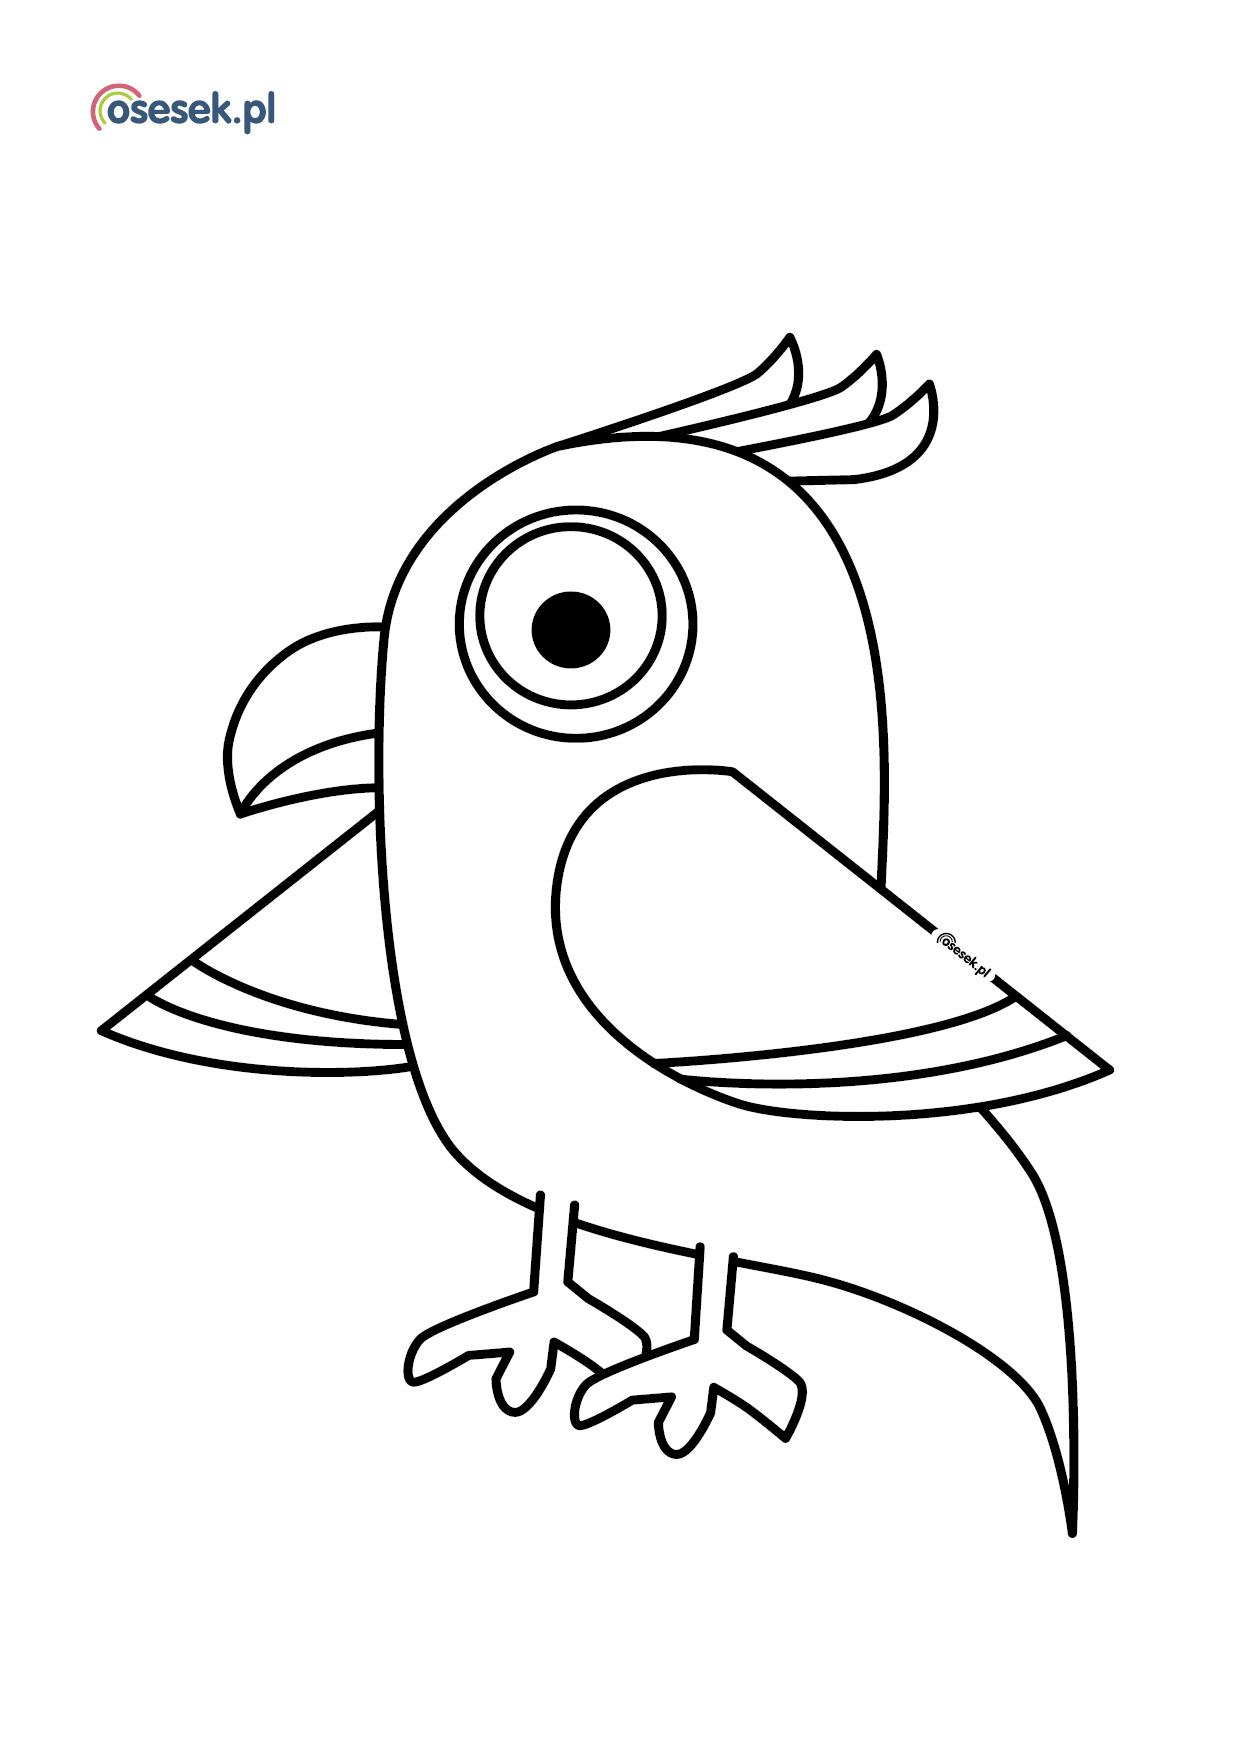 Papuga Arabella Kolorowanka Dla Dzieci Do Druku Osesek